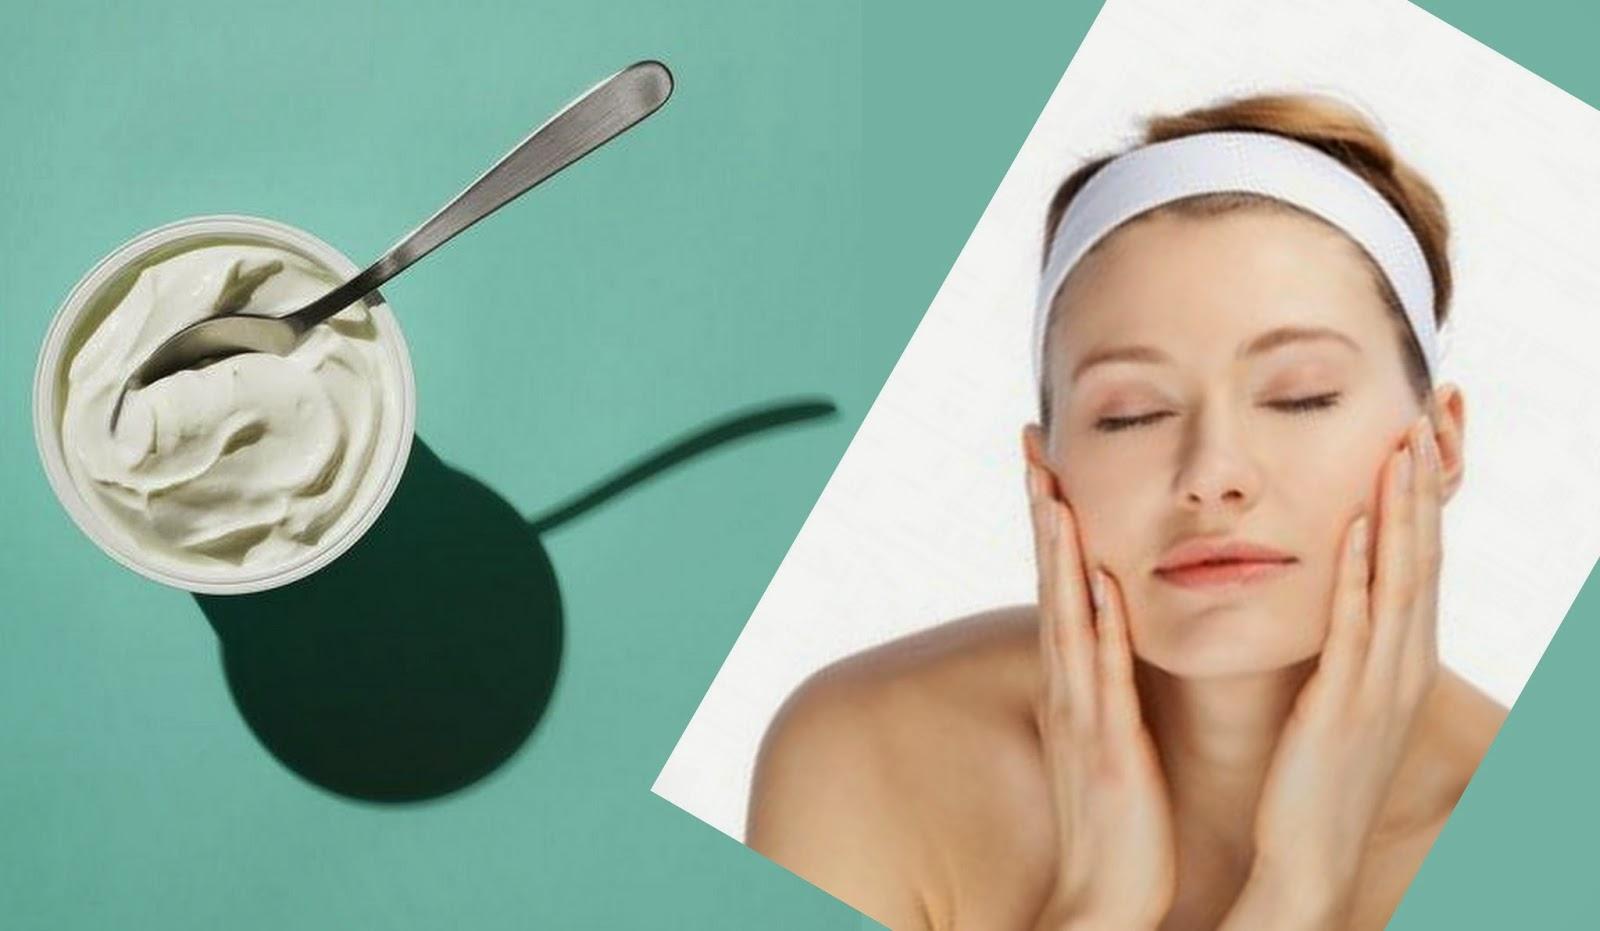 probiotics help in acne, rosacea and eczema